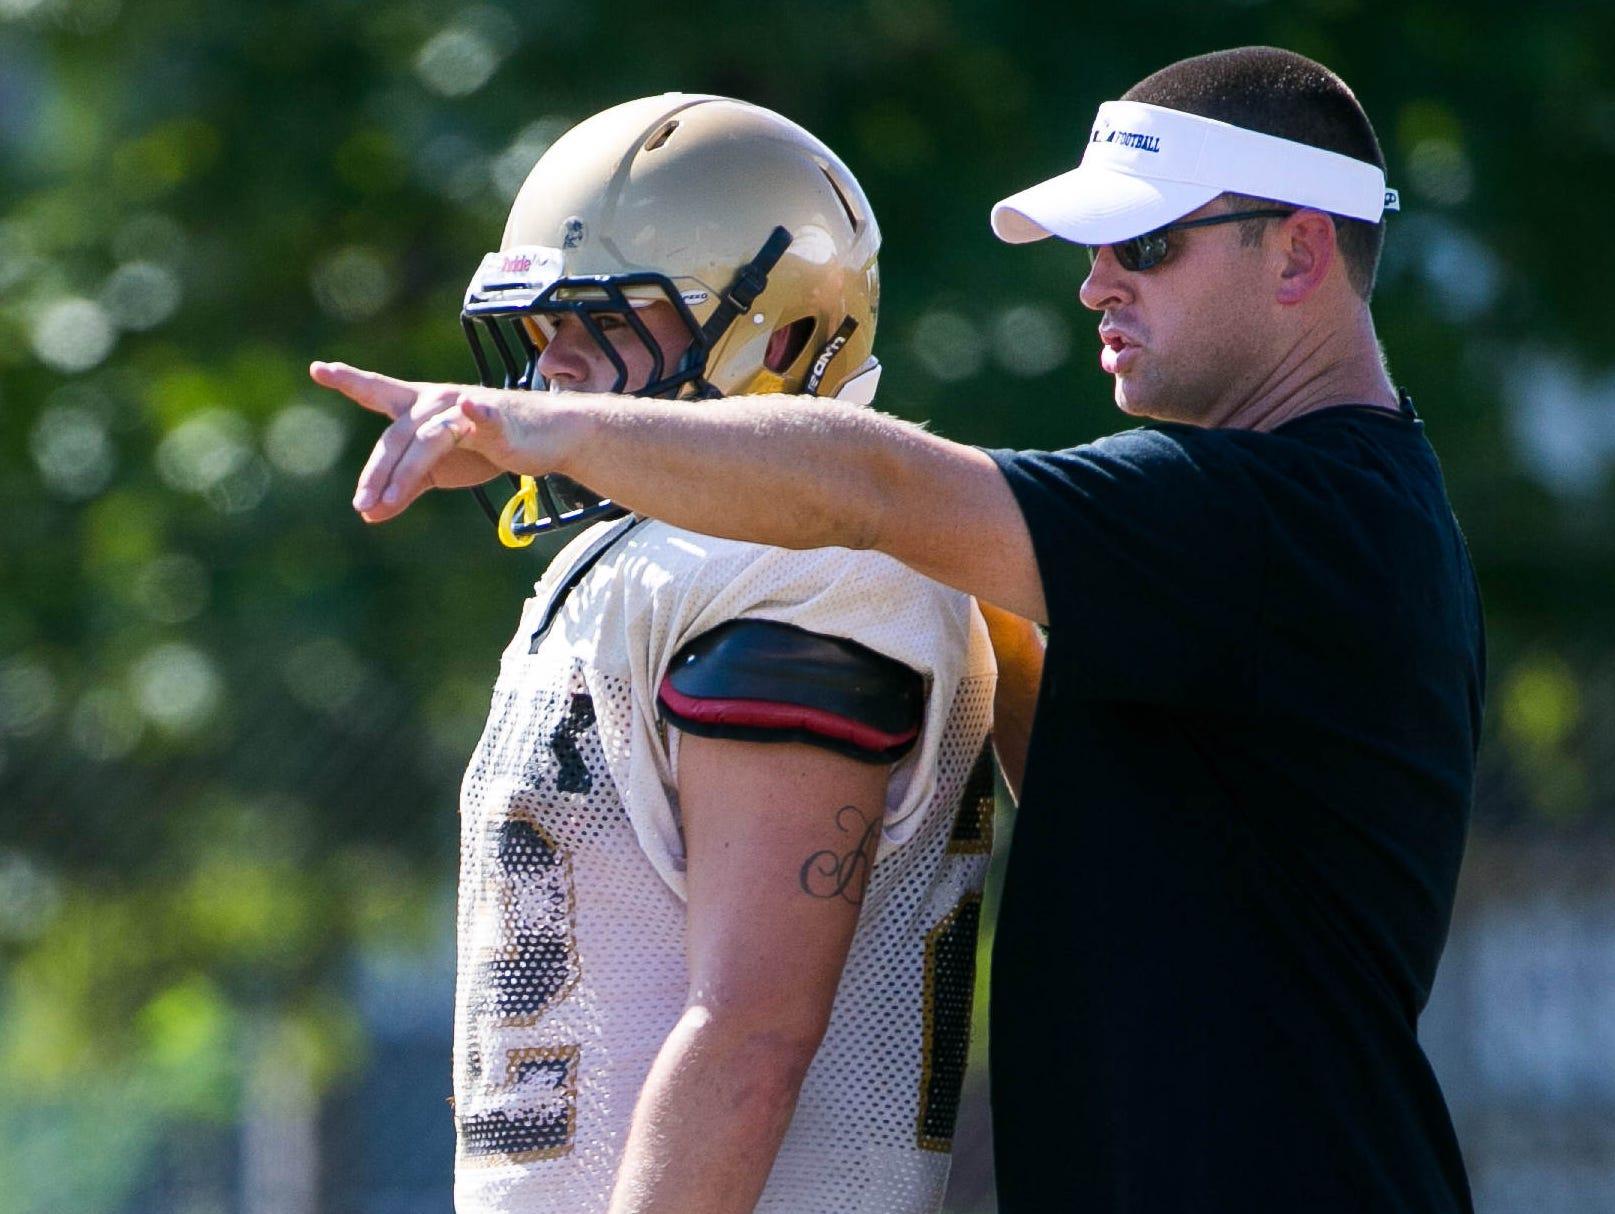 New Newark High football coach Barry Zehnder runs his team through drills during practice on Tuesday.